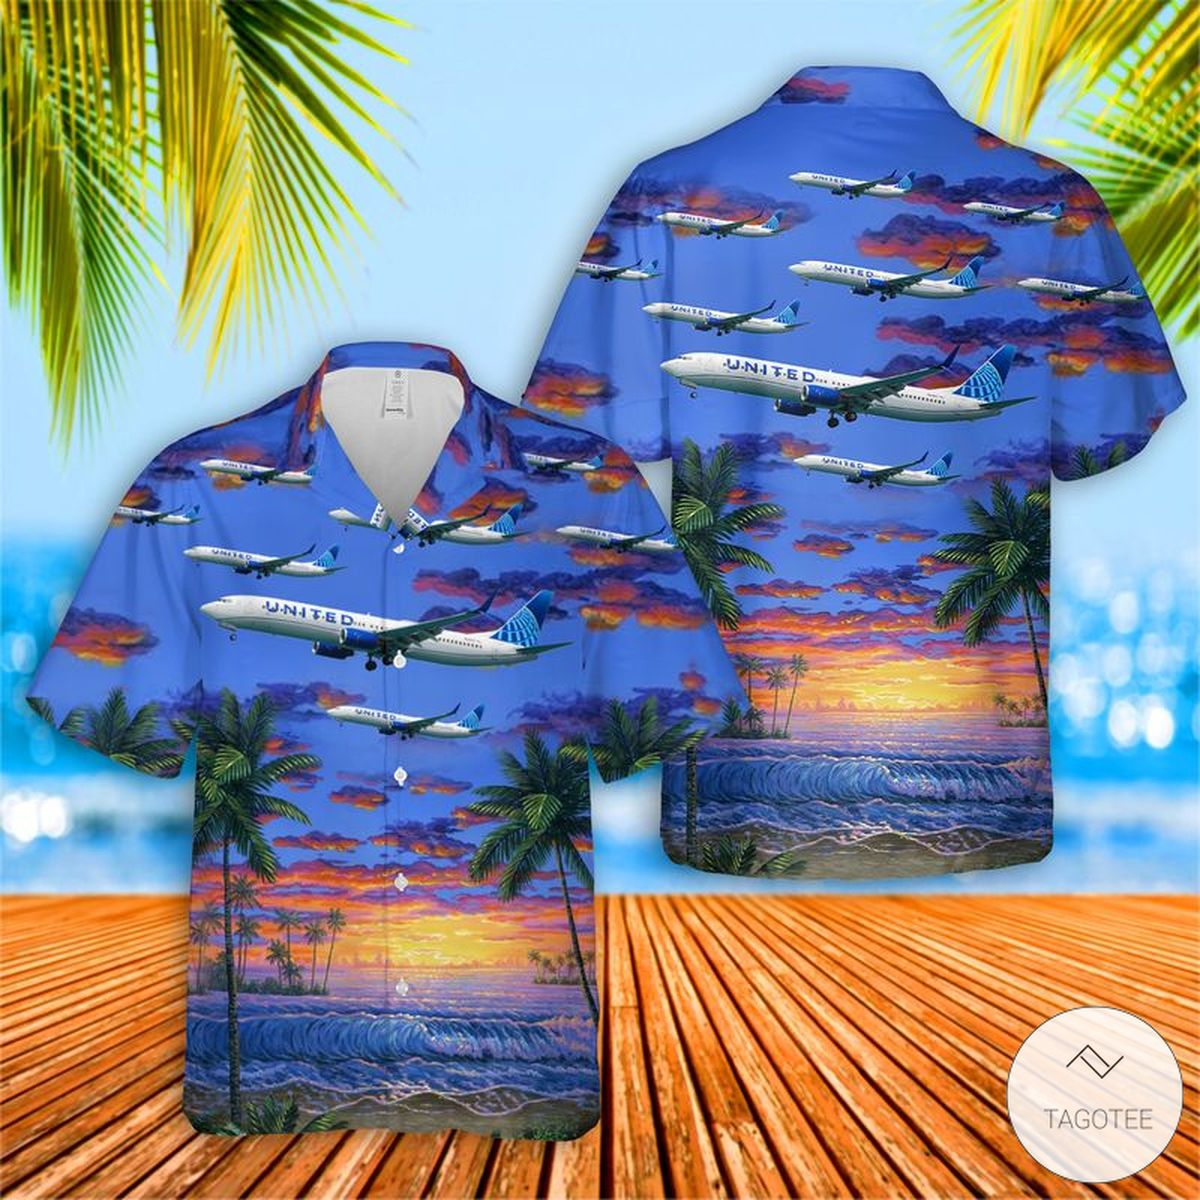 United Airlines Boeing 737-924ER Hawaiian Shirt, Beach Short